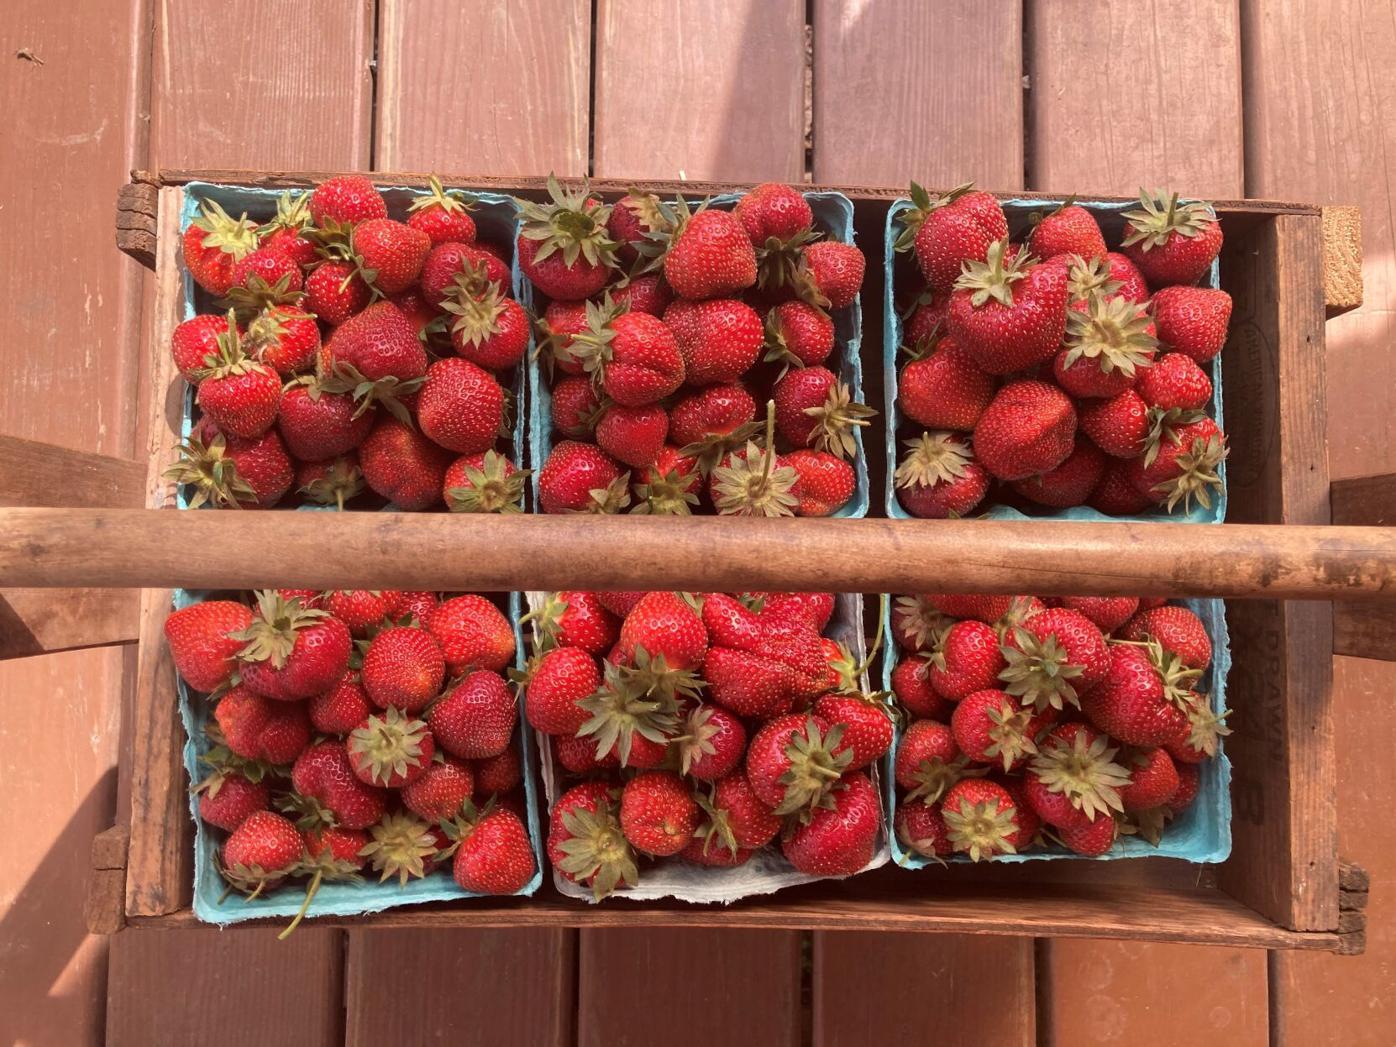 Strawberries from Gap View Farm Market